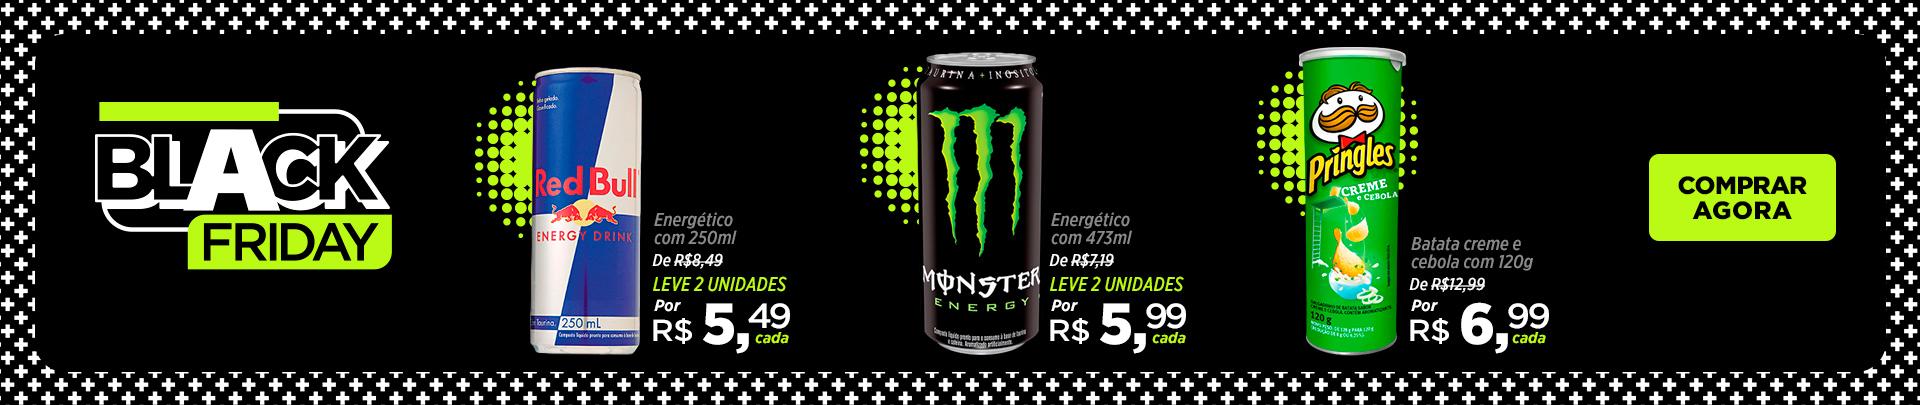 Black_Alimentos1